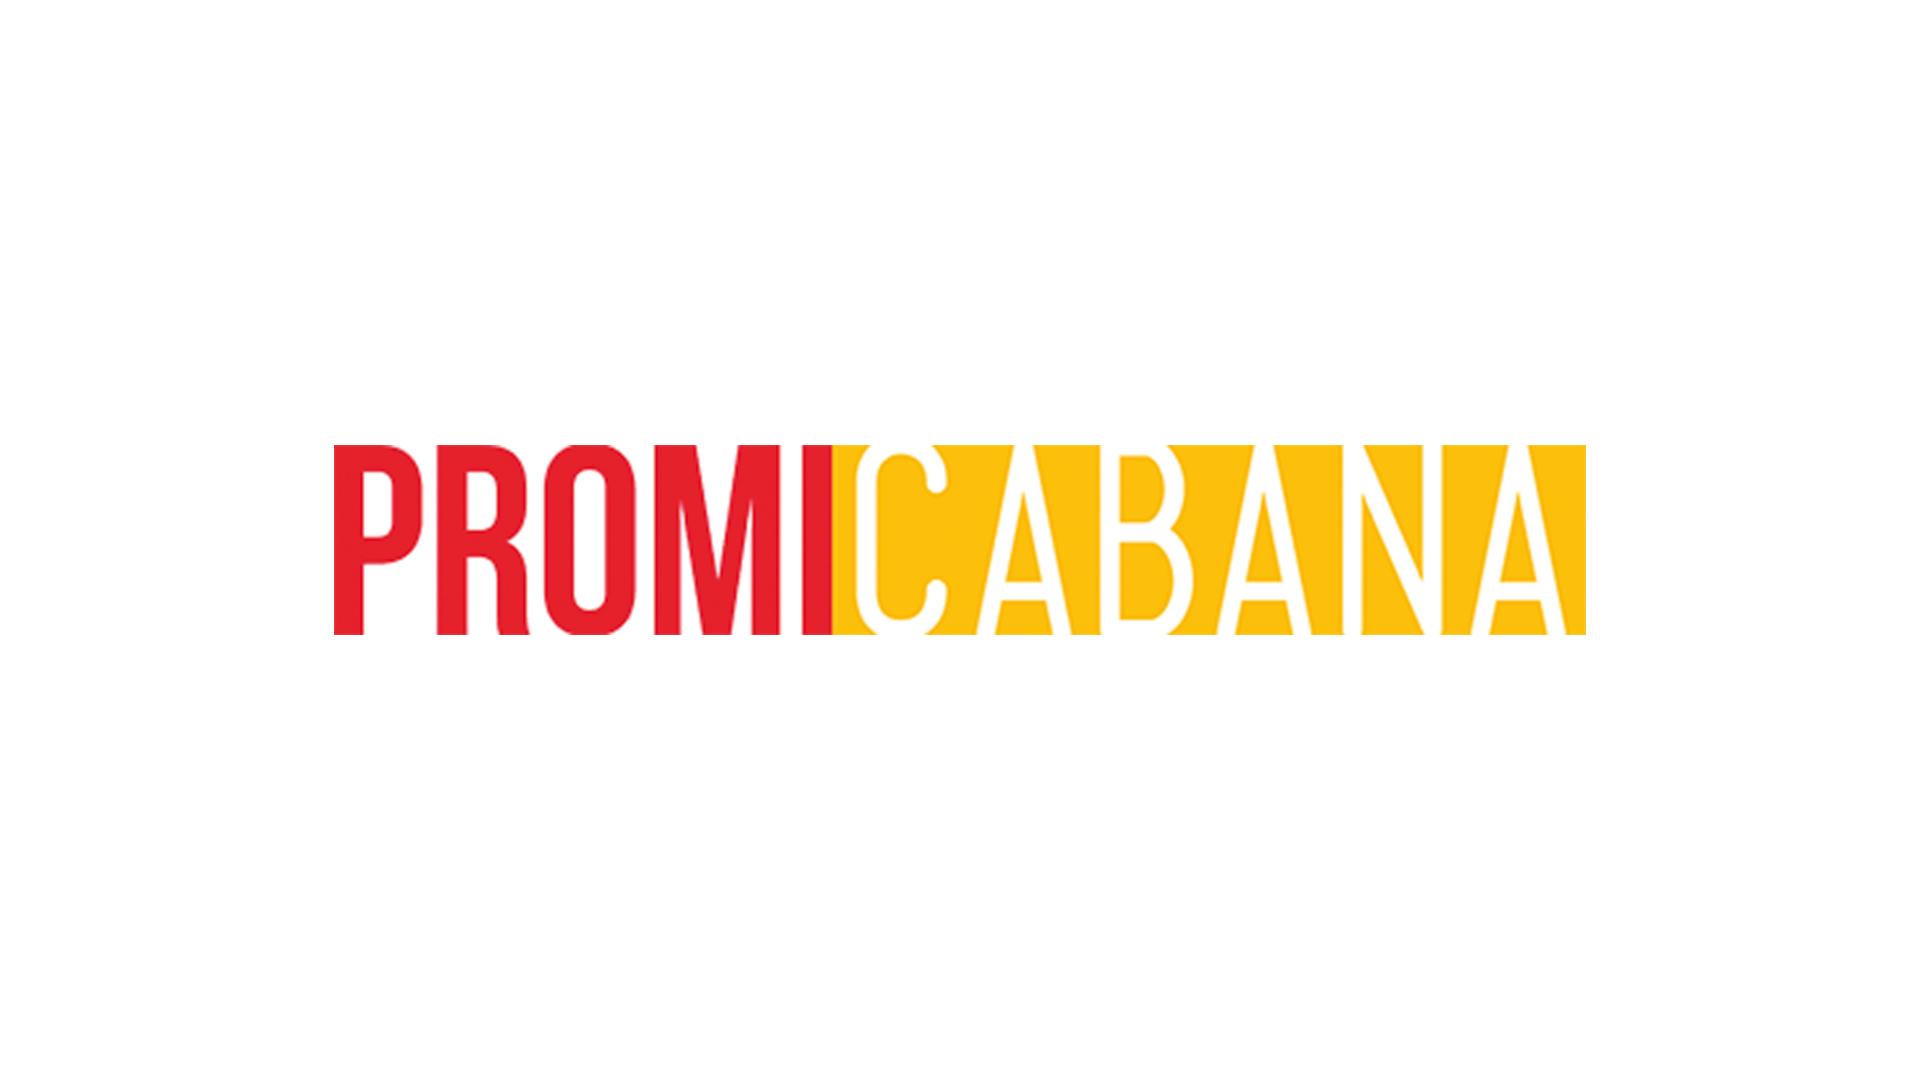 Justin-Bieber-Be-Alright-Believe-Clip